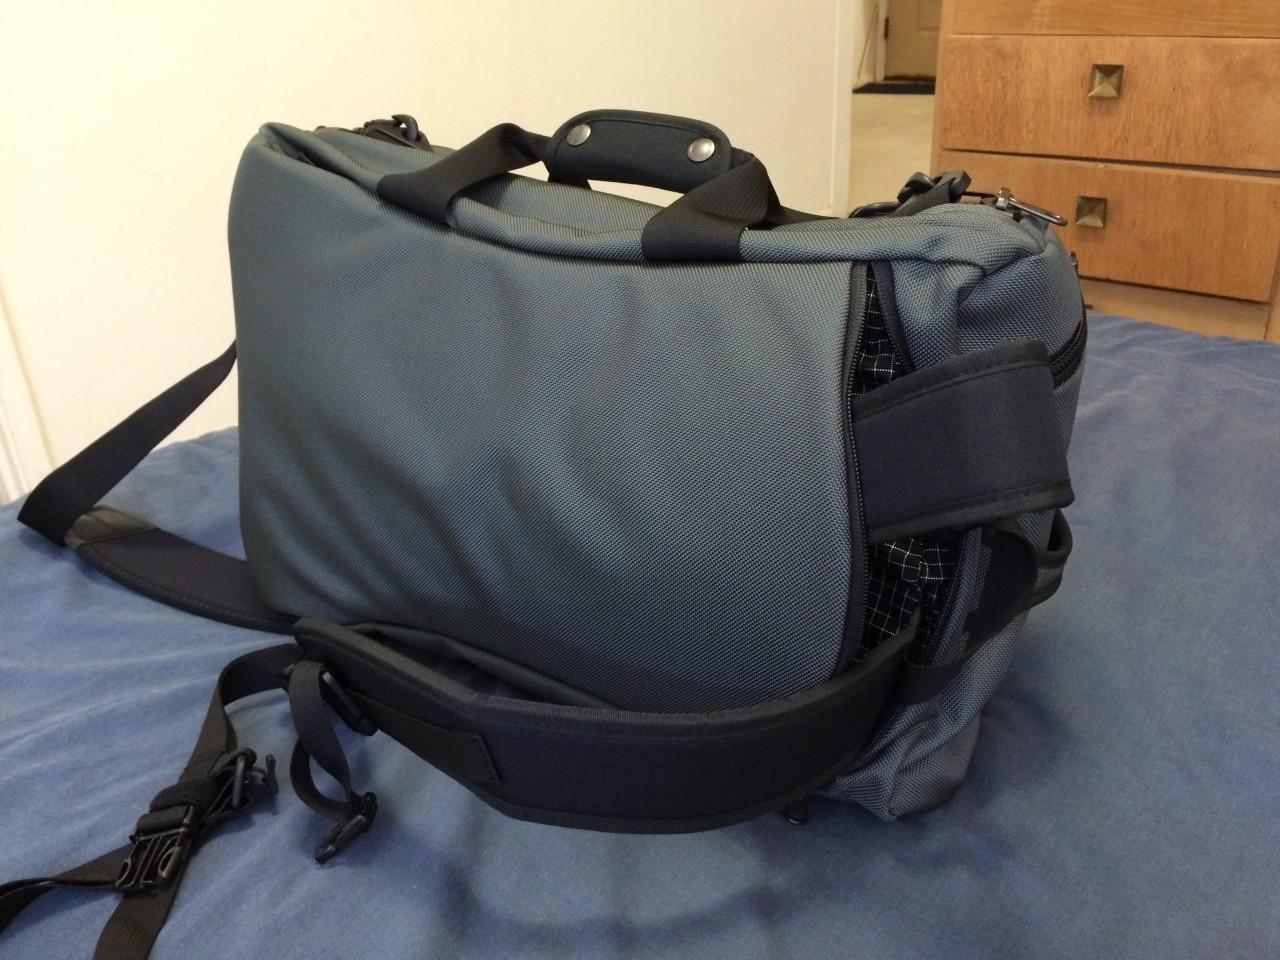 Tom Bihn Aeronaut 30 backpack strap removal